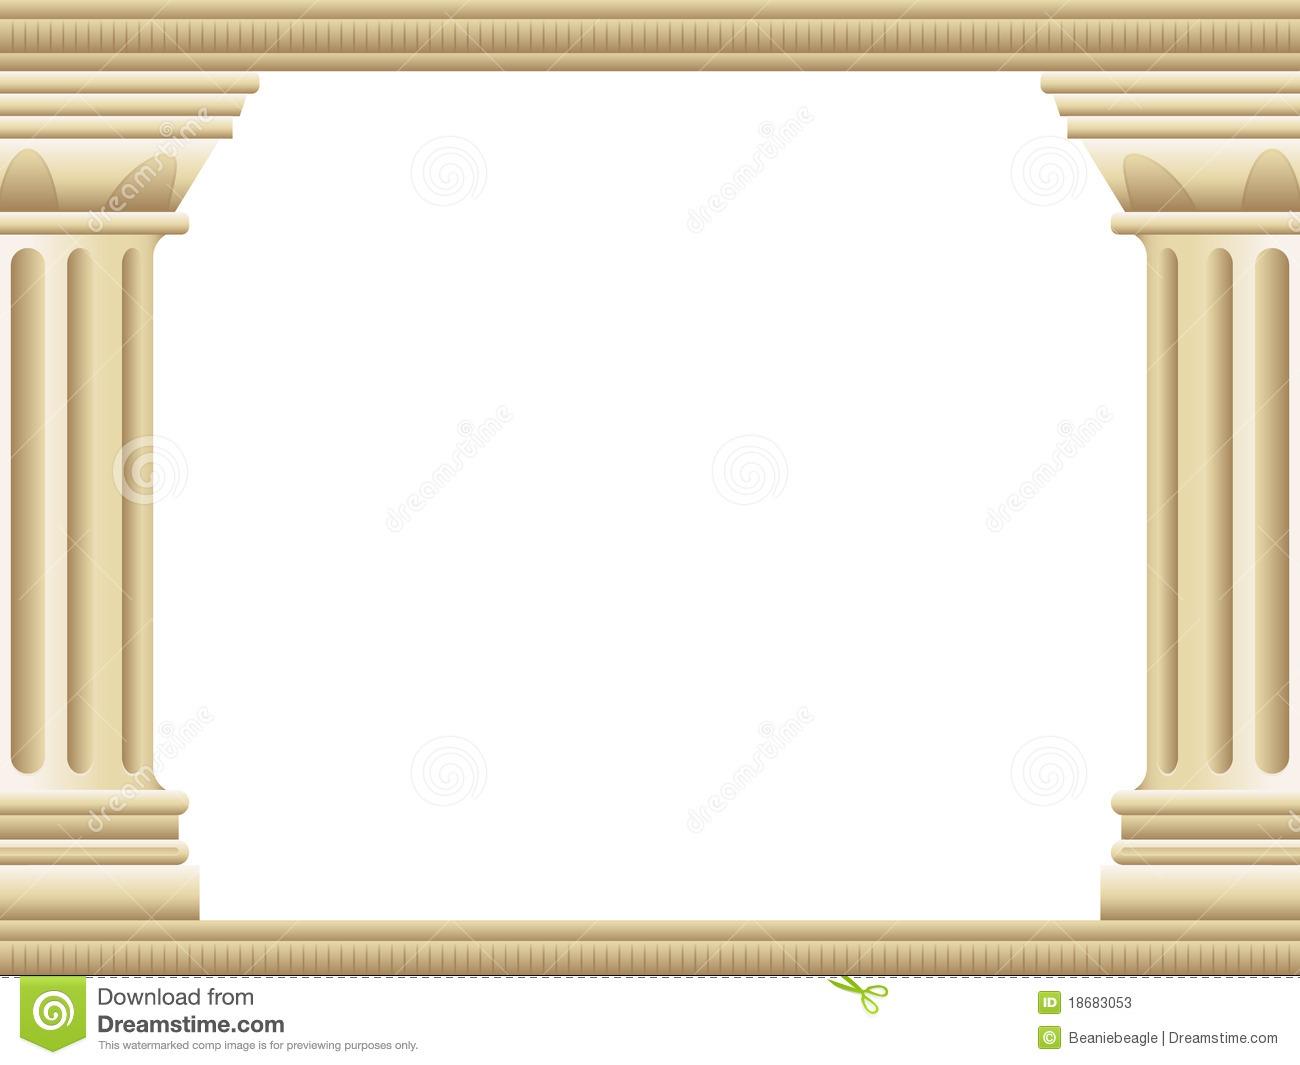 Greek Key Vector Background - Download Free Vectors ...   Ancient Greece Wallpaper Designs